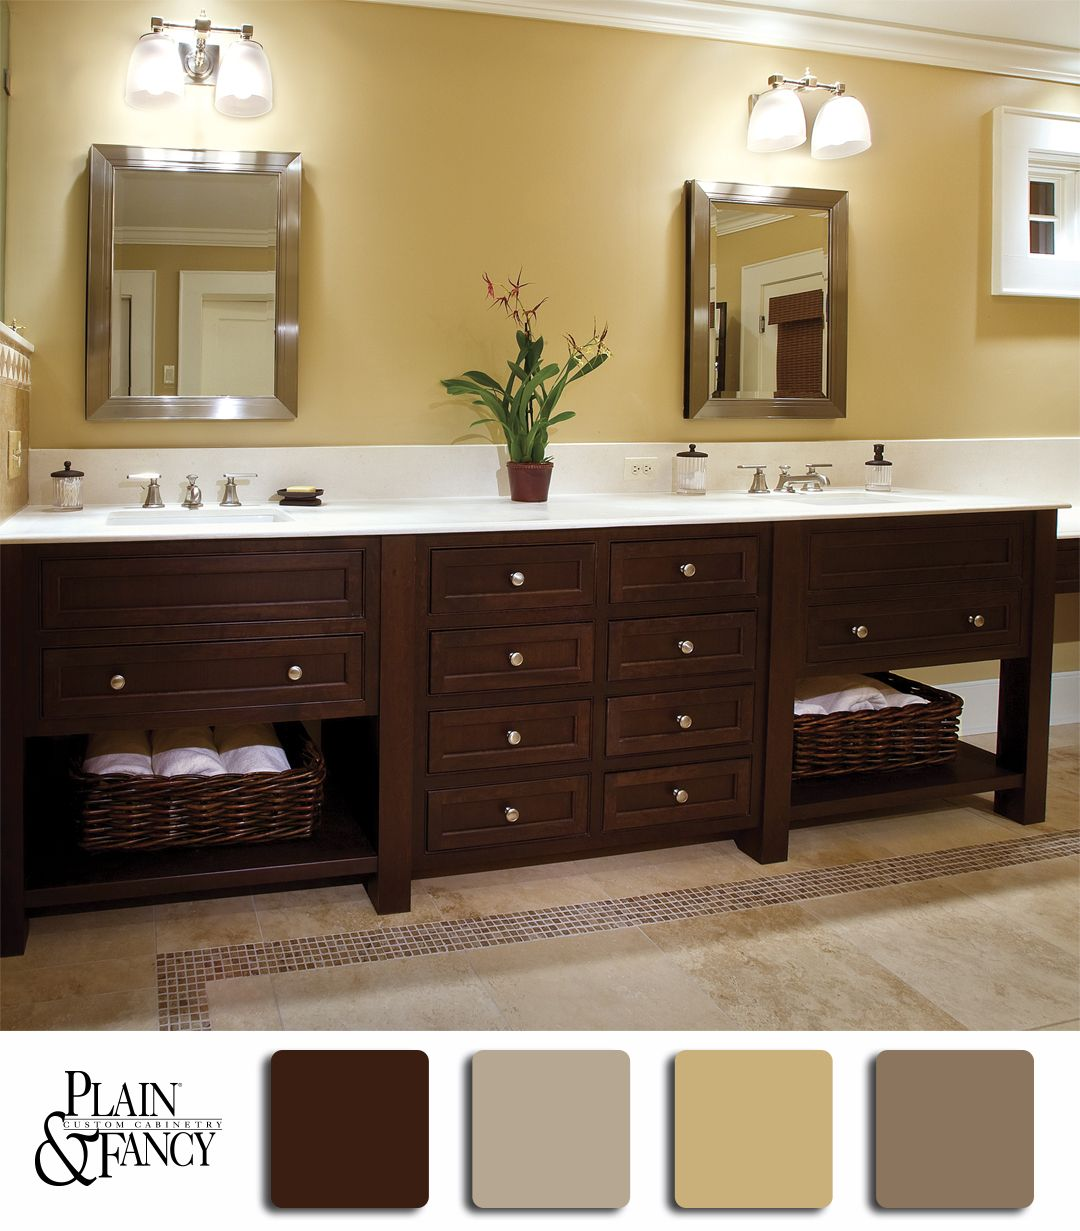 Westchester Master Bath: My Favorite Bathroom. I Need To Upgrade My Master Bath. My